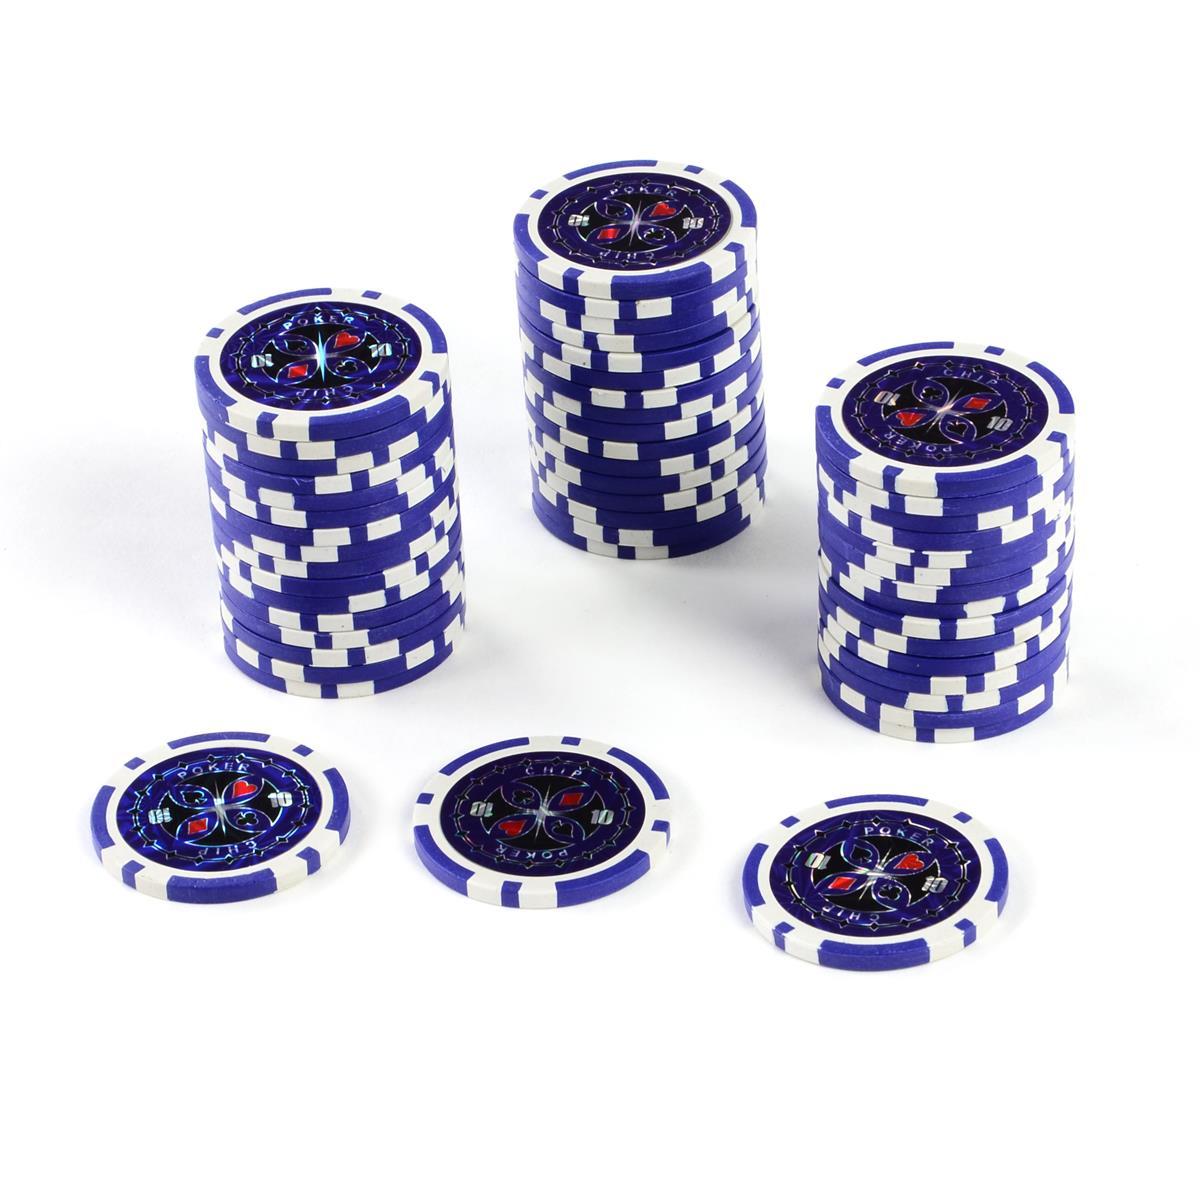 50 Poker-Chips Wert 10 Laserchip 12g Metallkern ergänzend zum Pokerkoffer